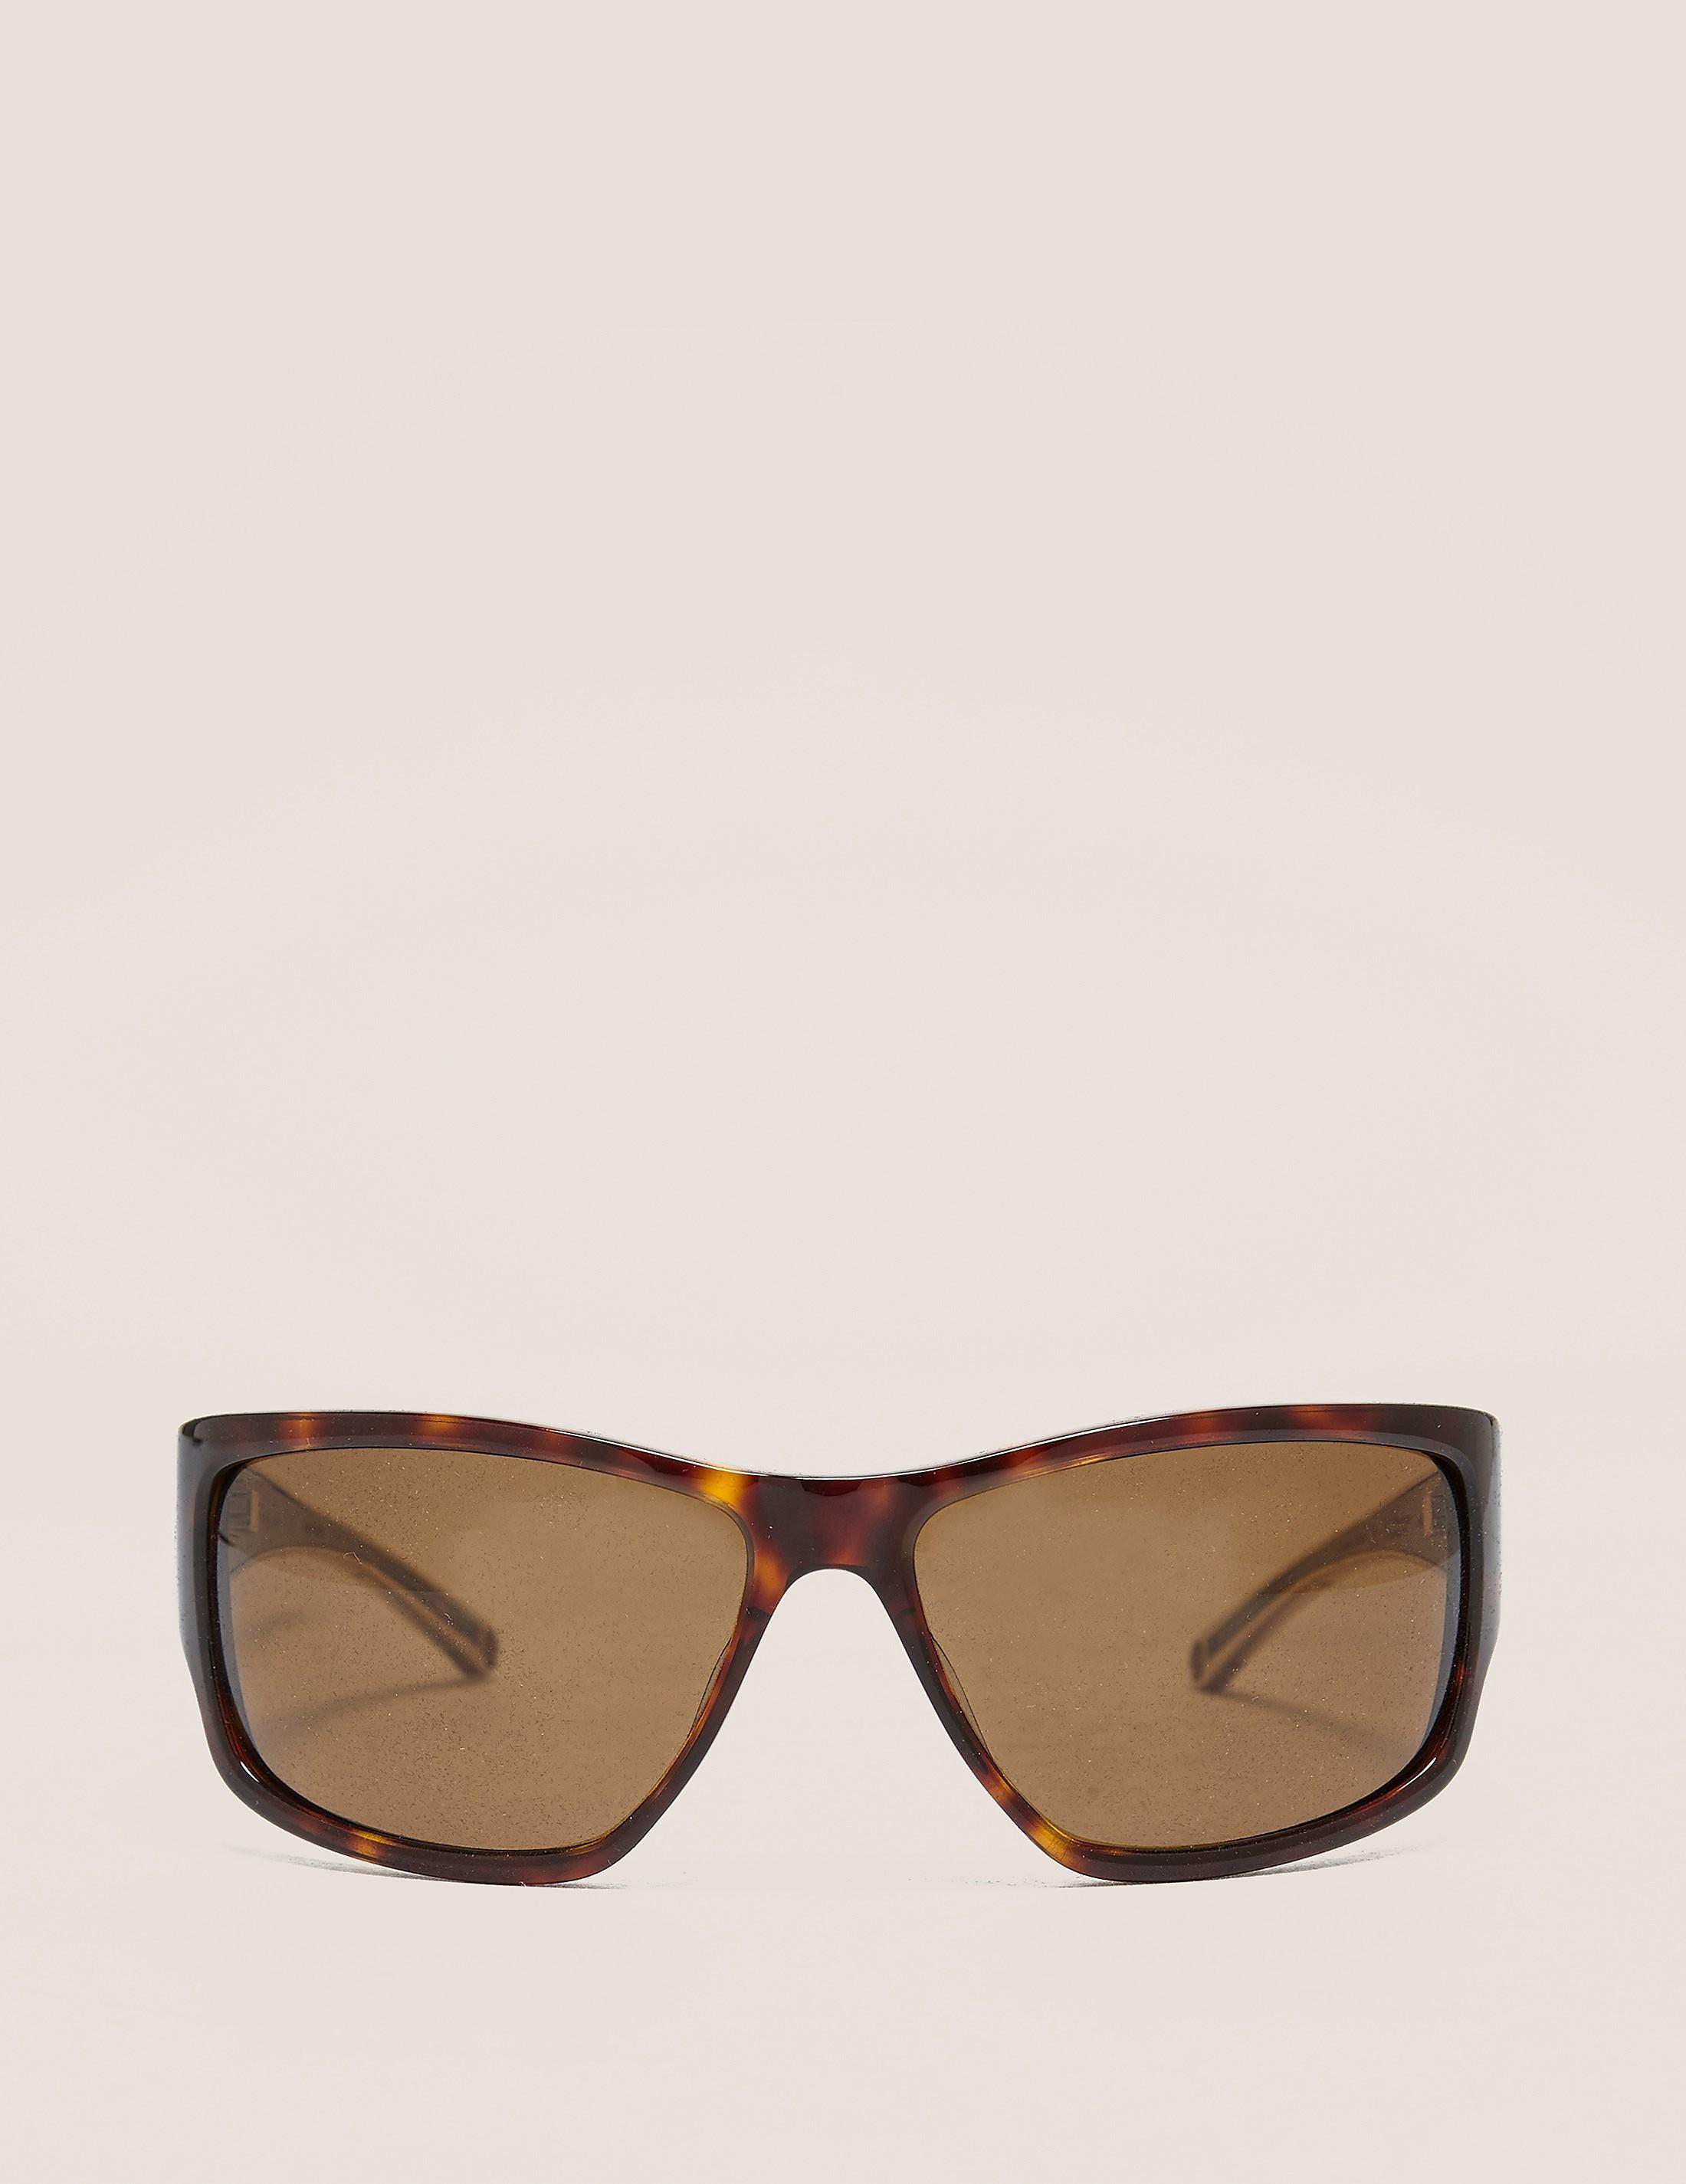 Oxford Vaughan Superyacht Sunglasses